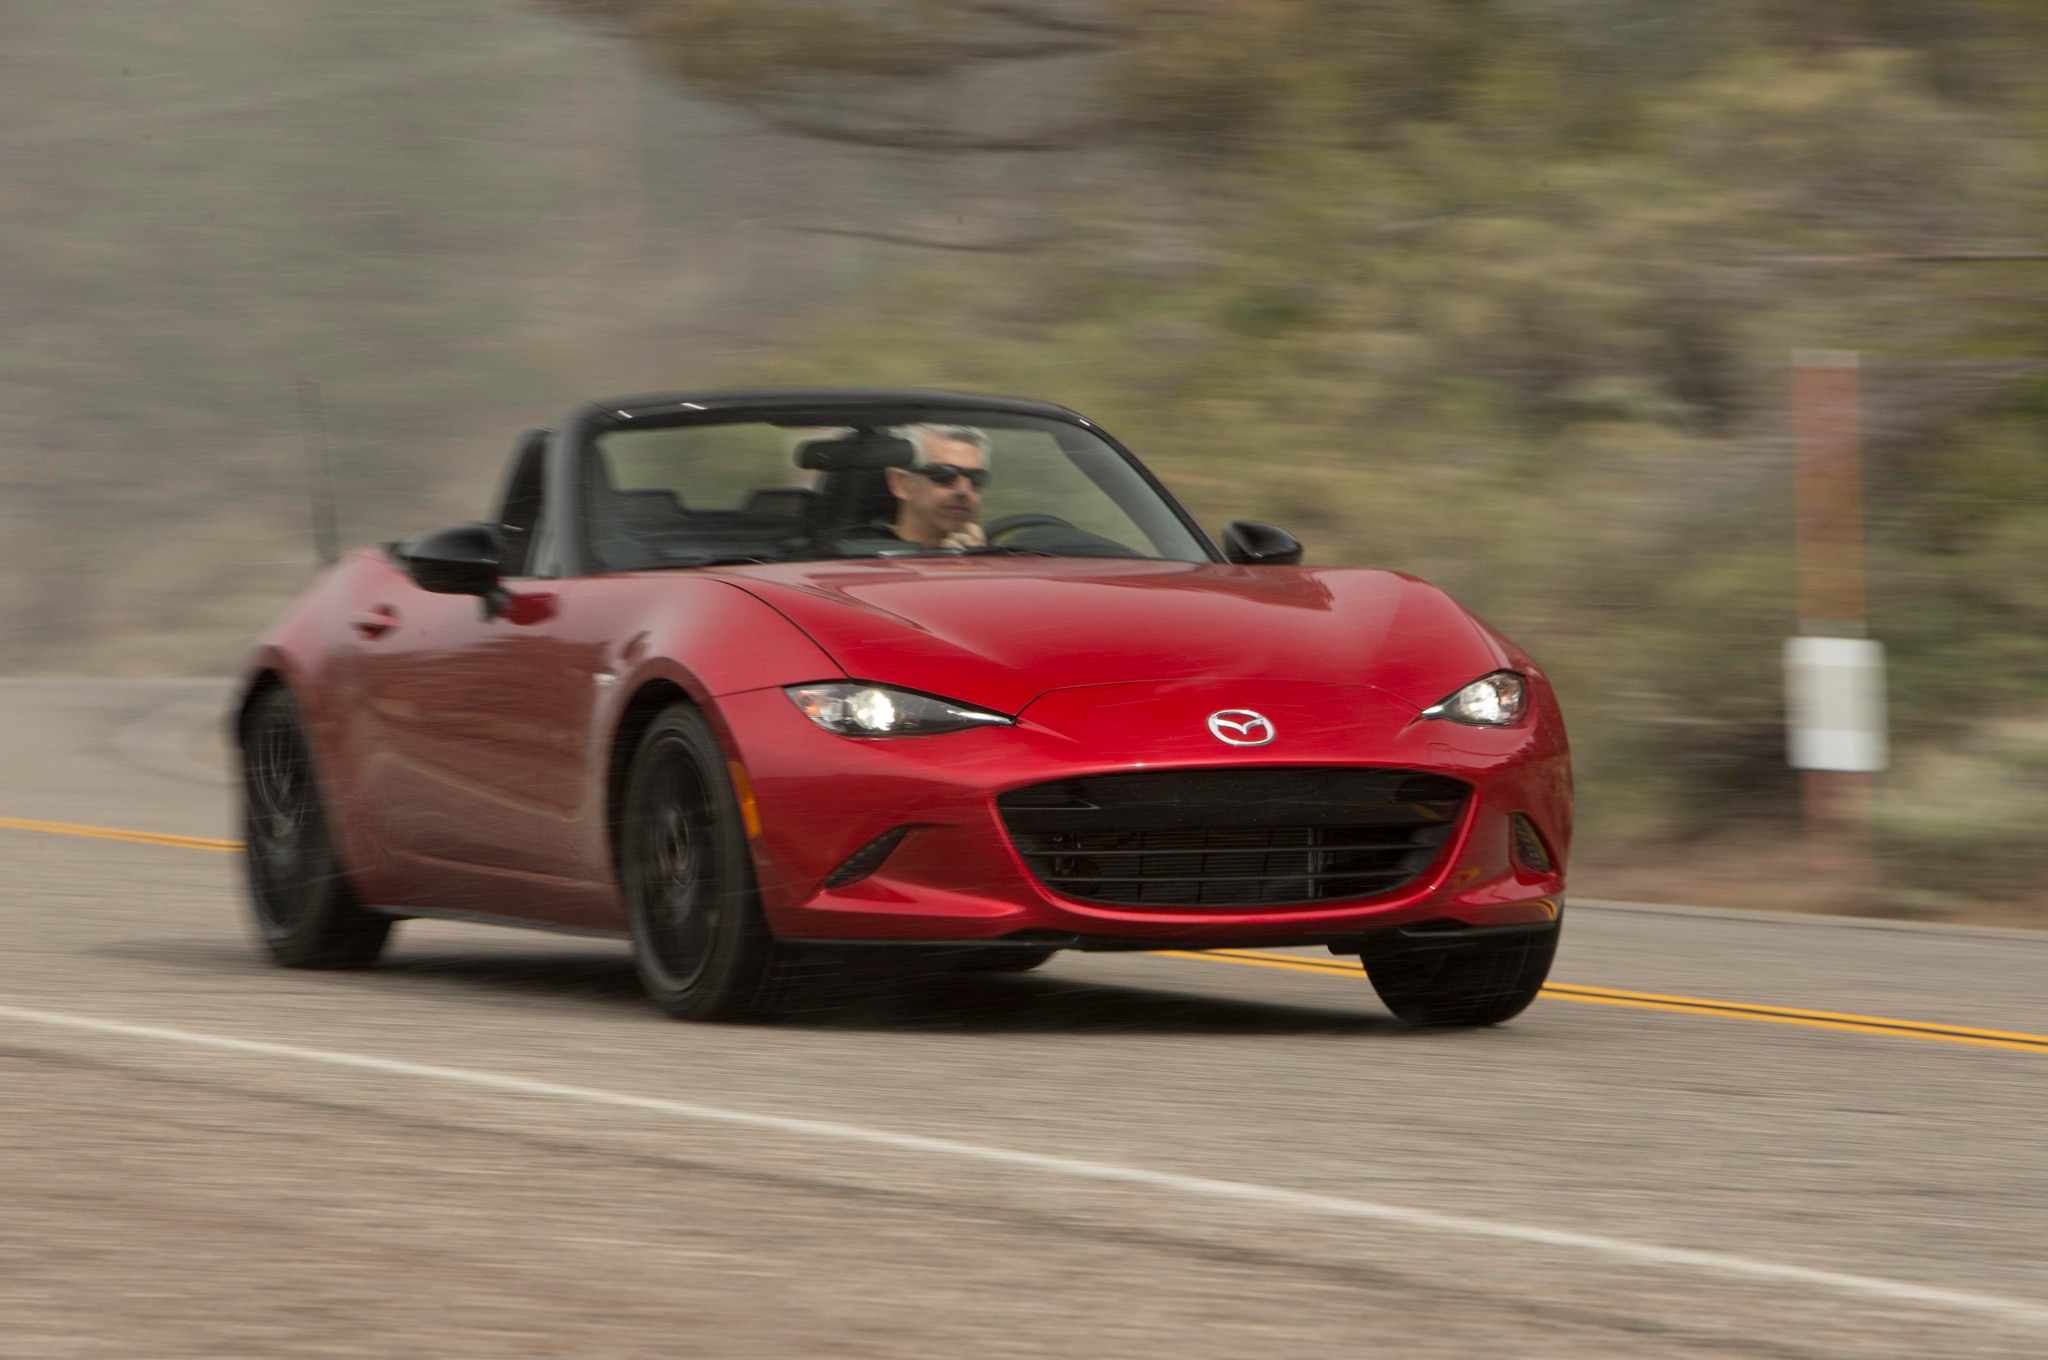 2016 Mazda MX 5 Miata Front Three Quarter In Motion 02